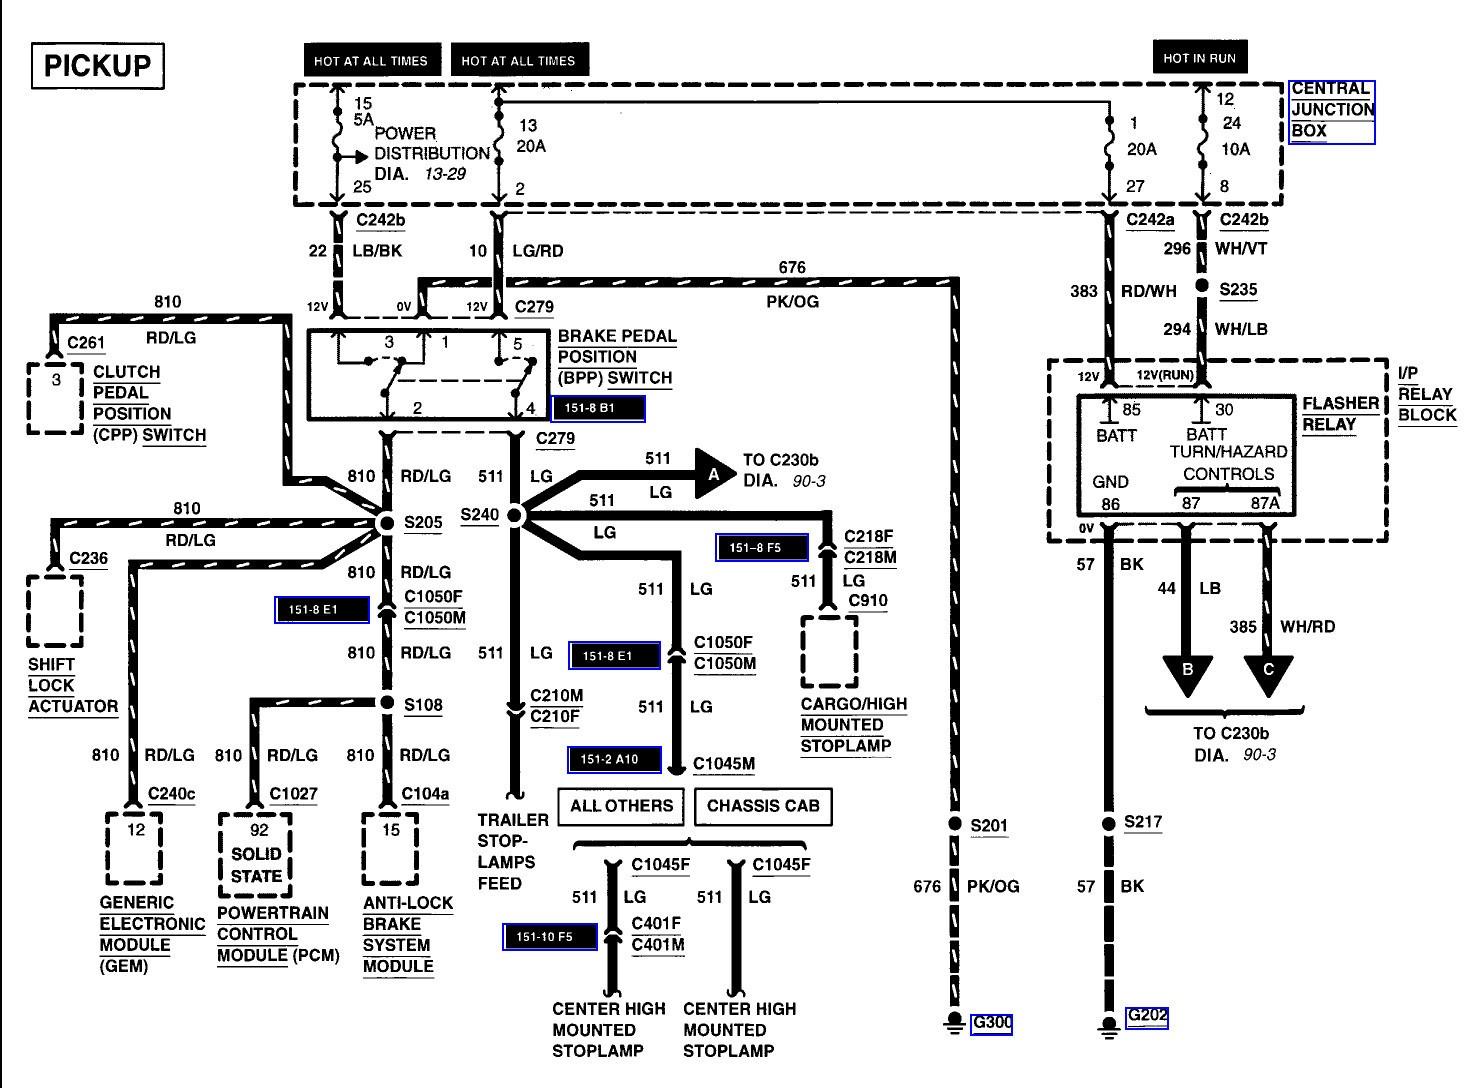 2001 Ford F350 Wiring Diagram - Wiring Diagram Details  Ford F Wiring Diagram on ford e 450 wiring diagrams, 1989 ford wiring diagram, 79 ford wiring diagram, ford aerostar wiring diagram, f250 wiring diagram, 1987 ford e350 wiring diagram, ford truck electrical diagrams, ford mirror wiring diagram, ford alternator plug wiring diagram, 1956 ford wiring diagram, ford f-350 4x4 wiring diagrams, ford econoline van wiring diagram, 01 dodge 1500 wiring diagram, ford fairlane wiring diagram, 86 ford wiring diagram, ford oxygen sensor wiring 1990, ford falcon wiring-diagram, ford electrical wiring diagrams, ford 7 pin wiring diagram, ford super duty,